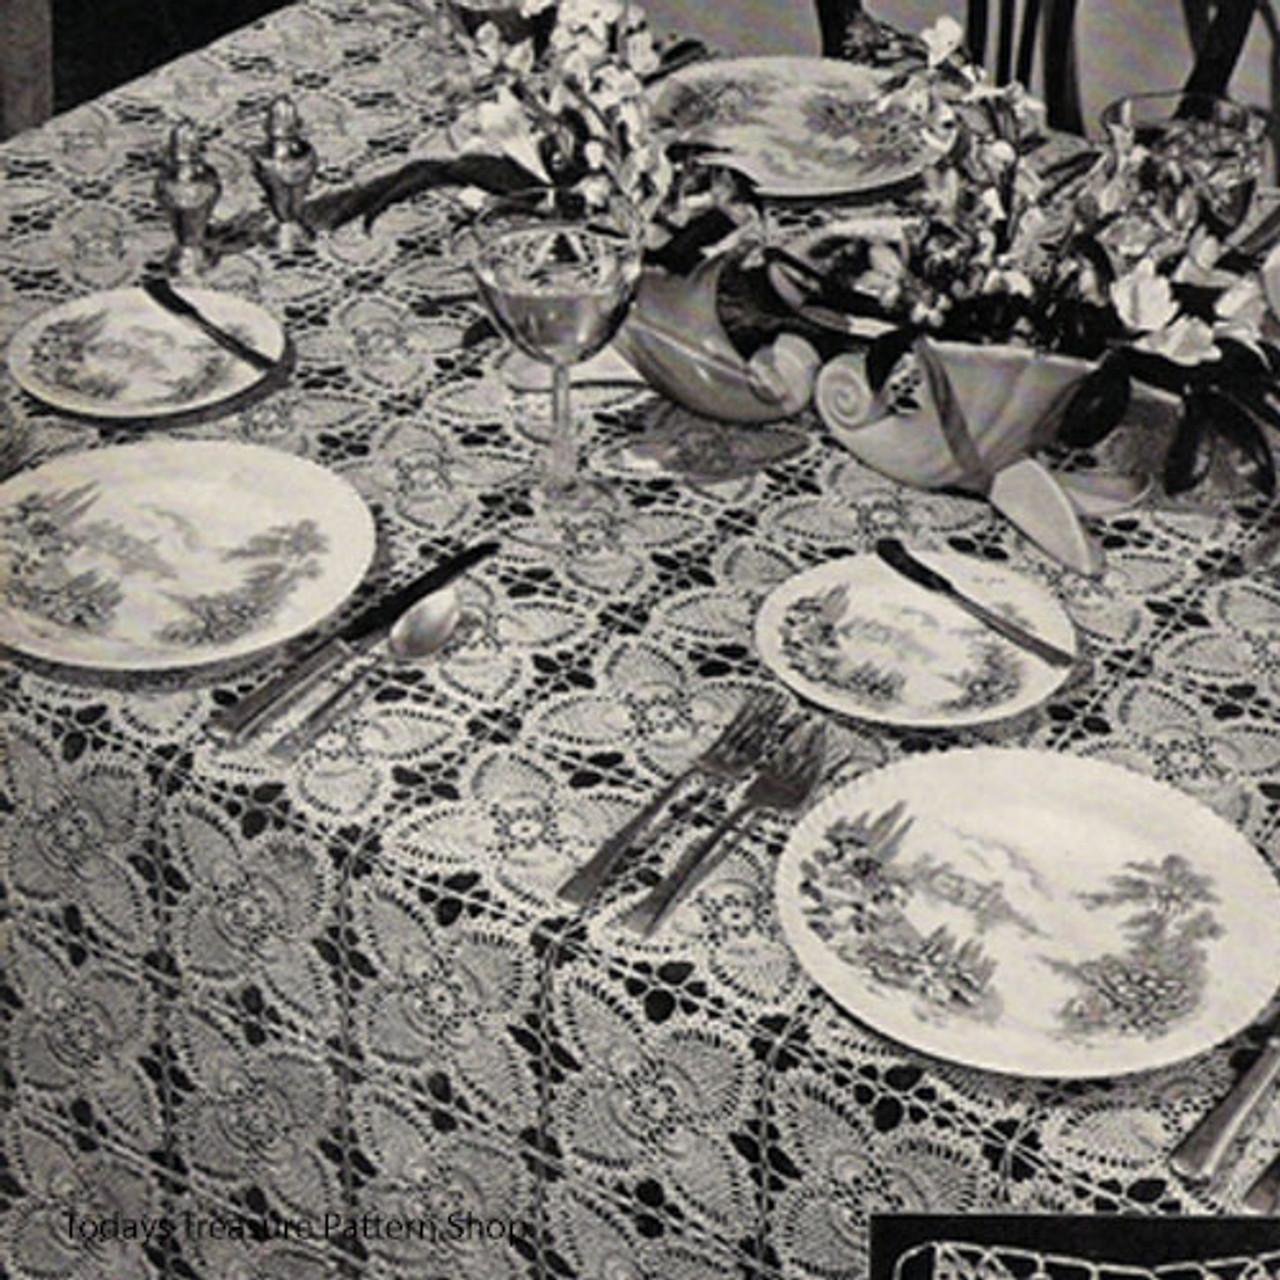 Crochet Pineapple Block Tablecloth pattern